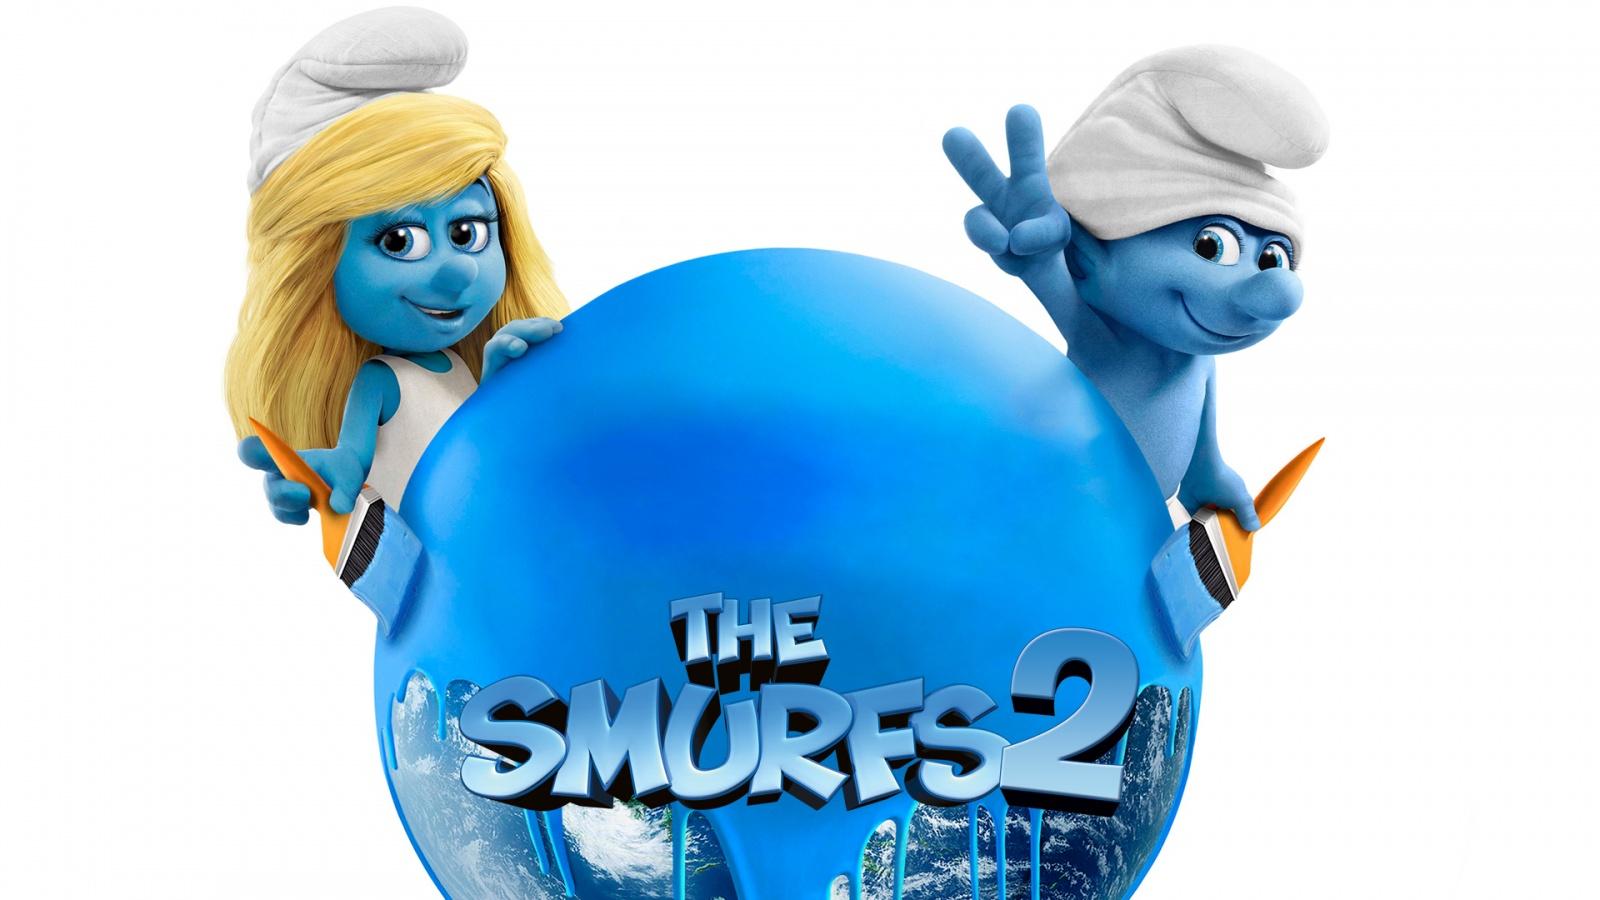 Free Smurfs 2 Full BEST Movie the_smurfs_2_11635